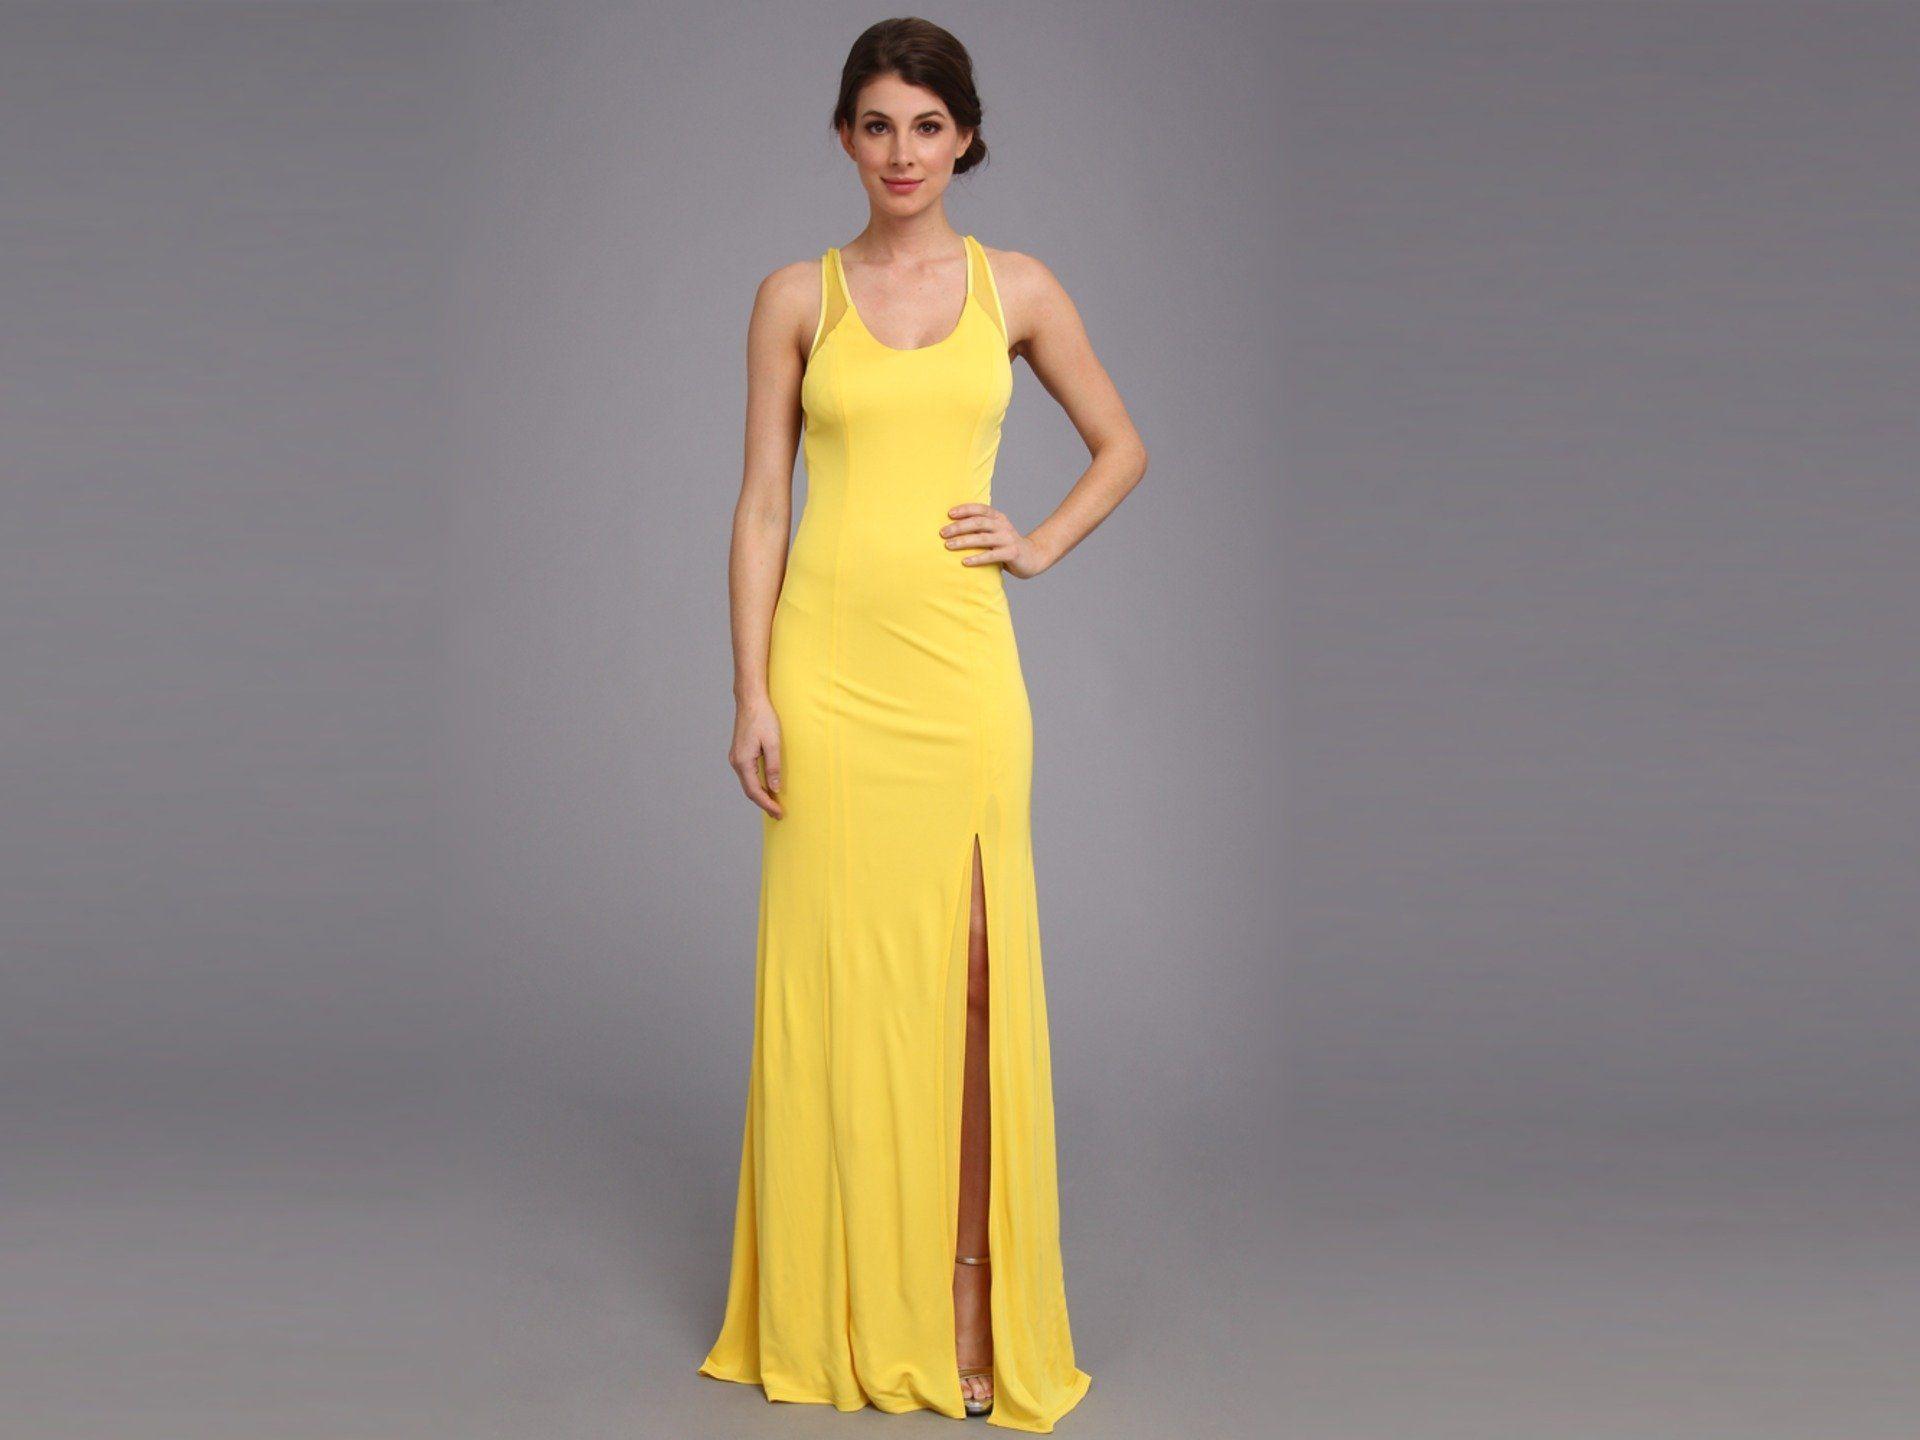 Yellow dress for women  ABS Allen Schwartz Womenus Tank Gown w Slit and CrossBack Mesh